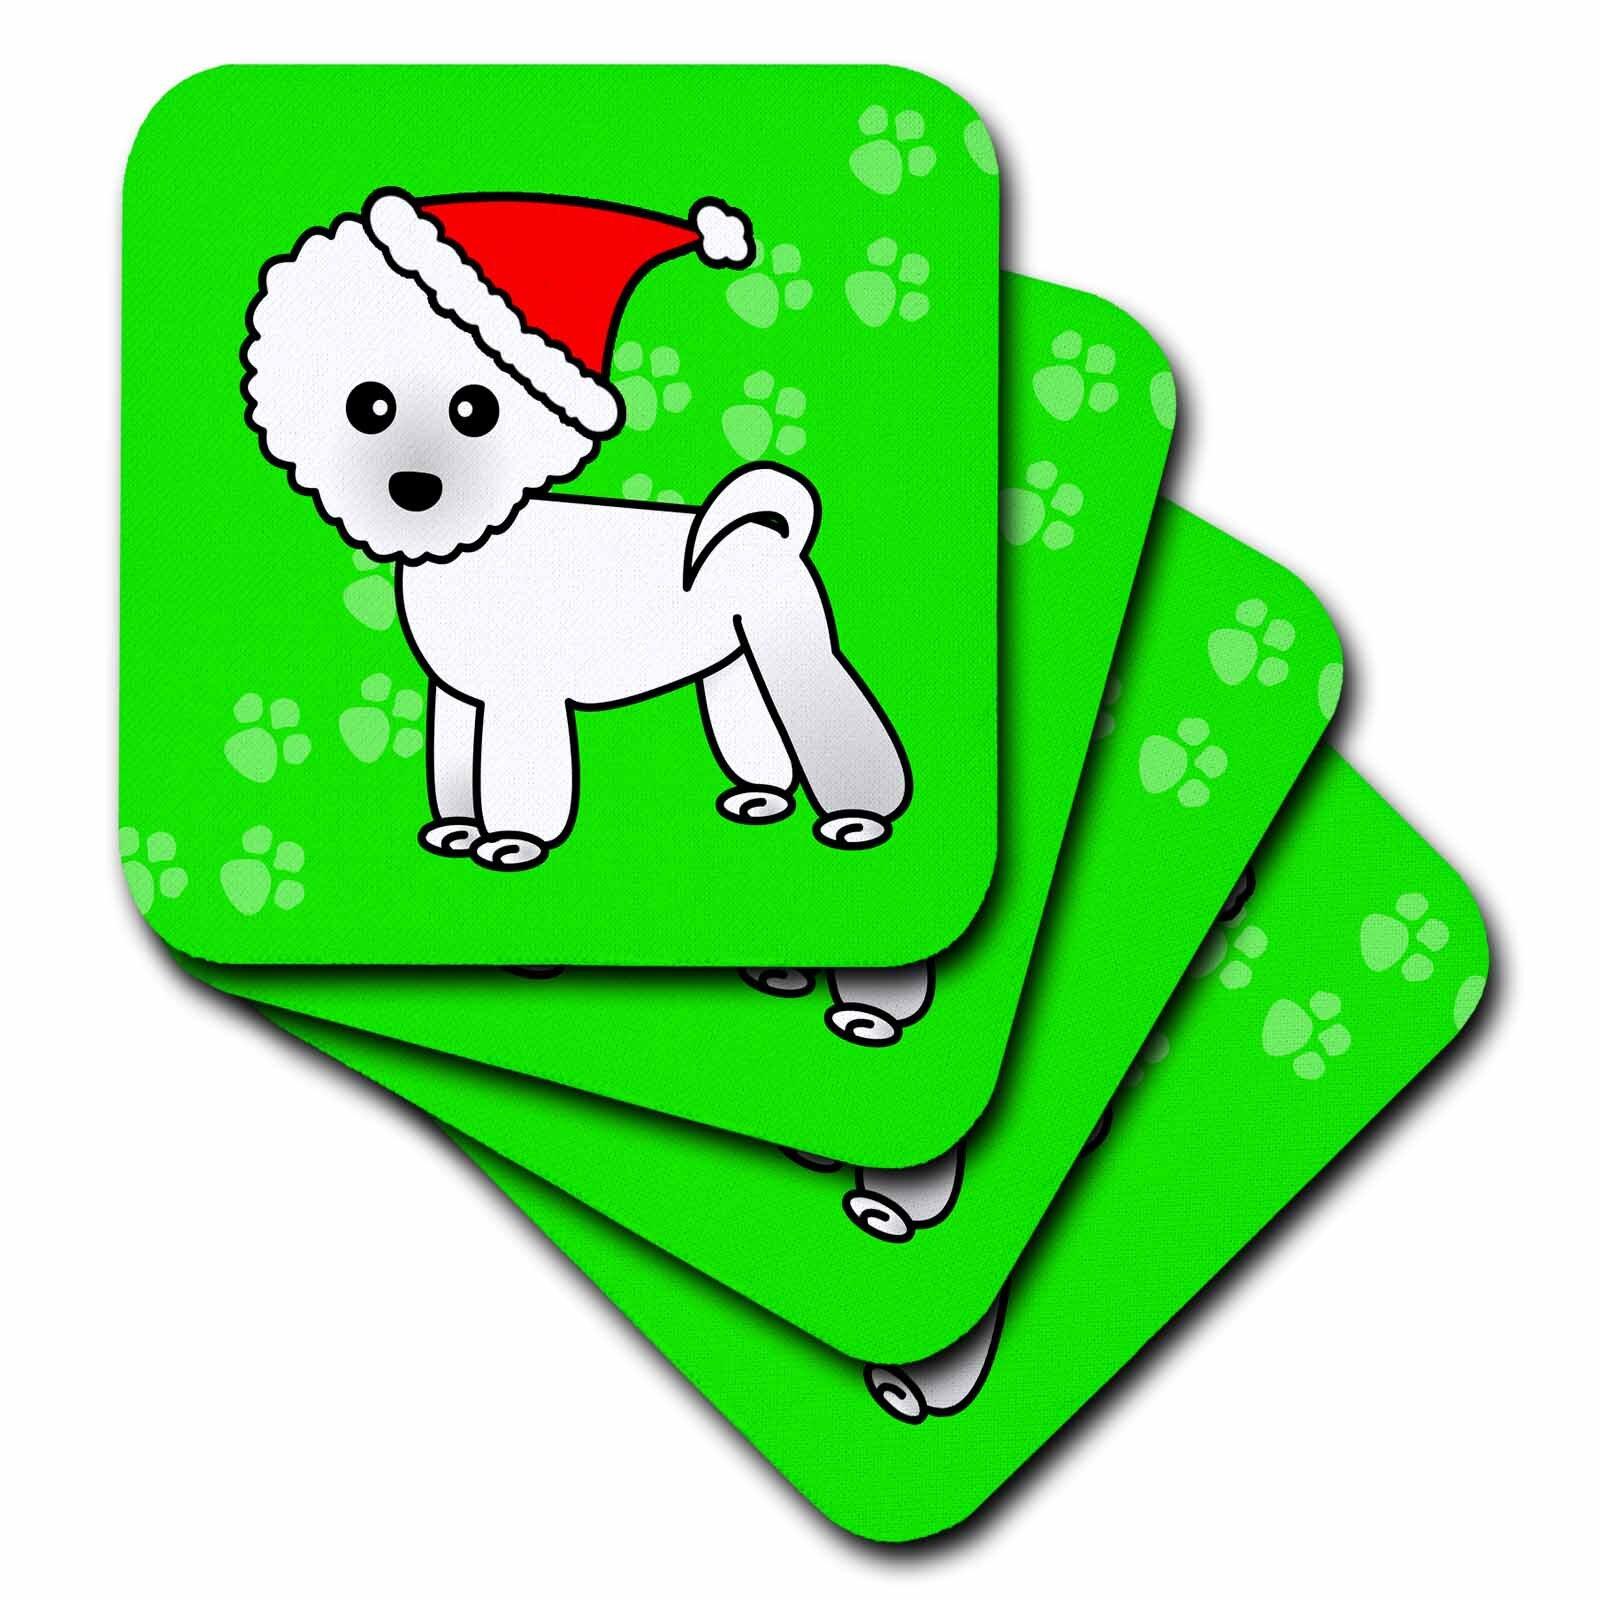 3drose Ceramic Tile Coasters Cute Bichon Frise Green Paw Background With Santa Hat Set Of 4 Cst 13818 3 Wayfair